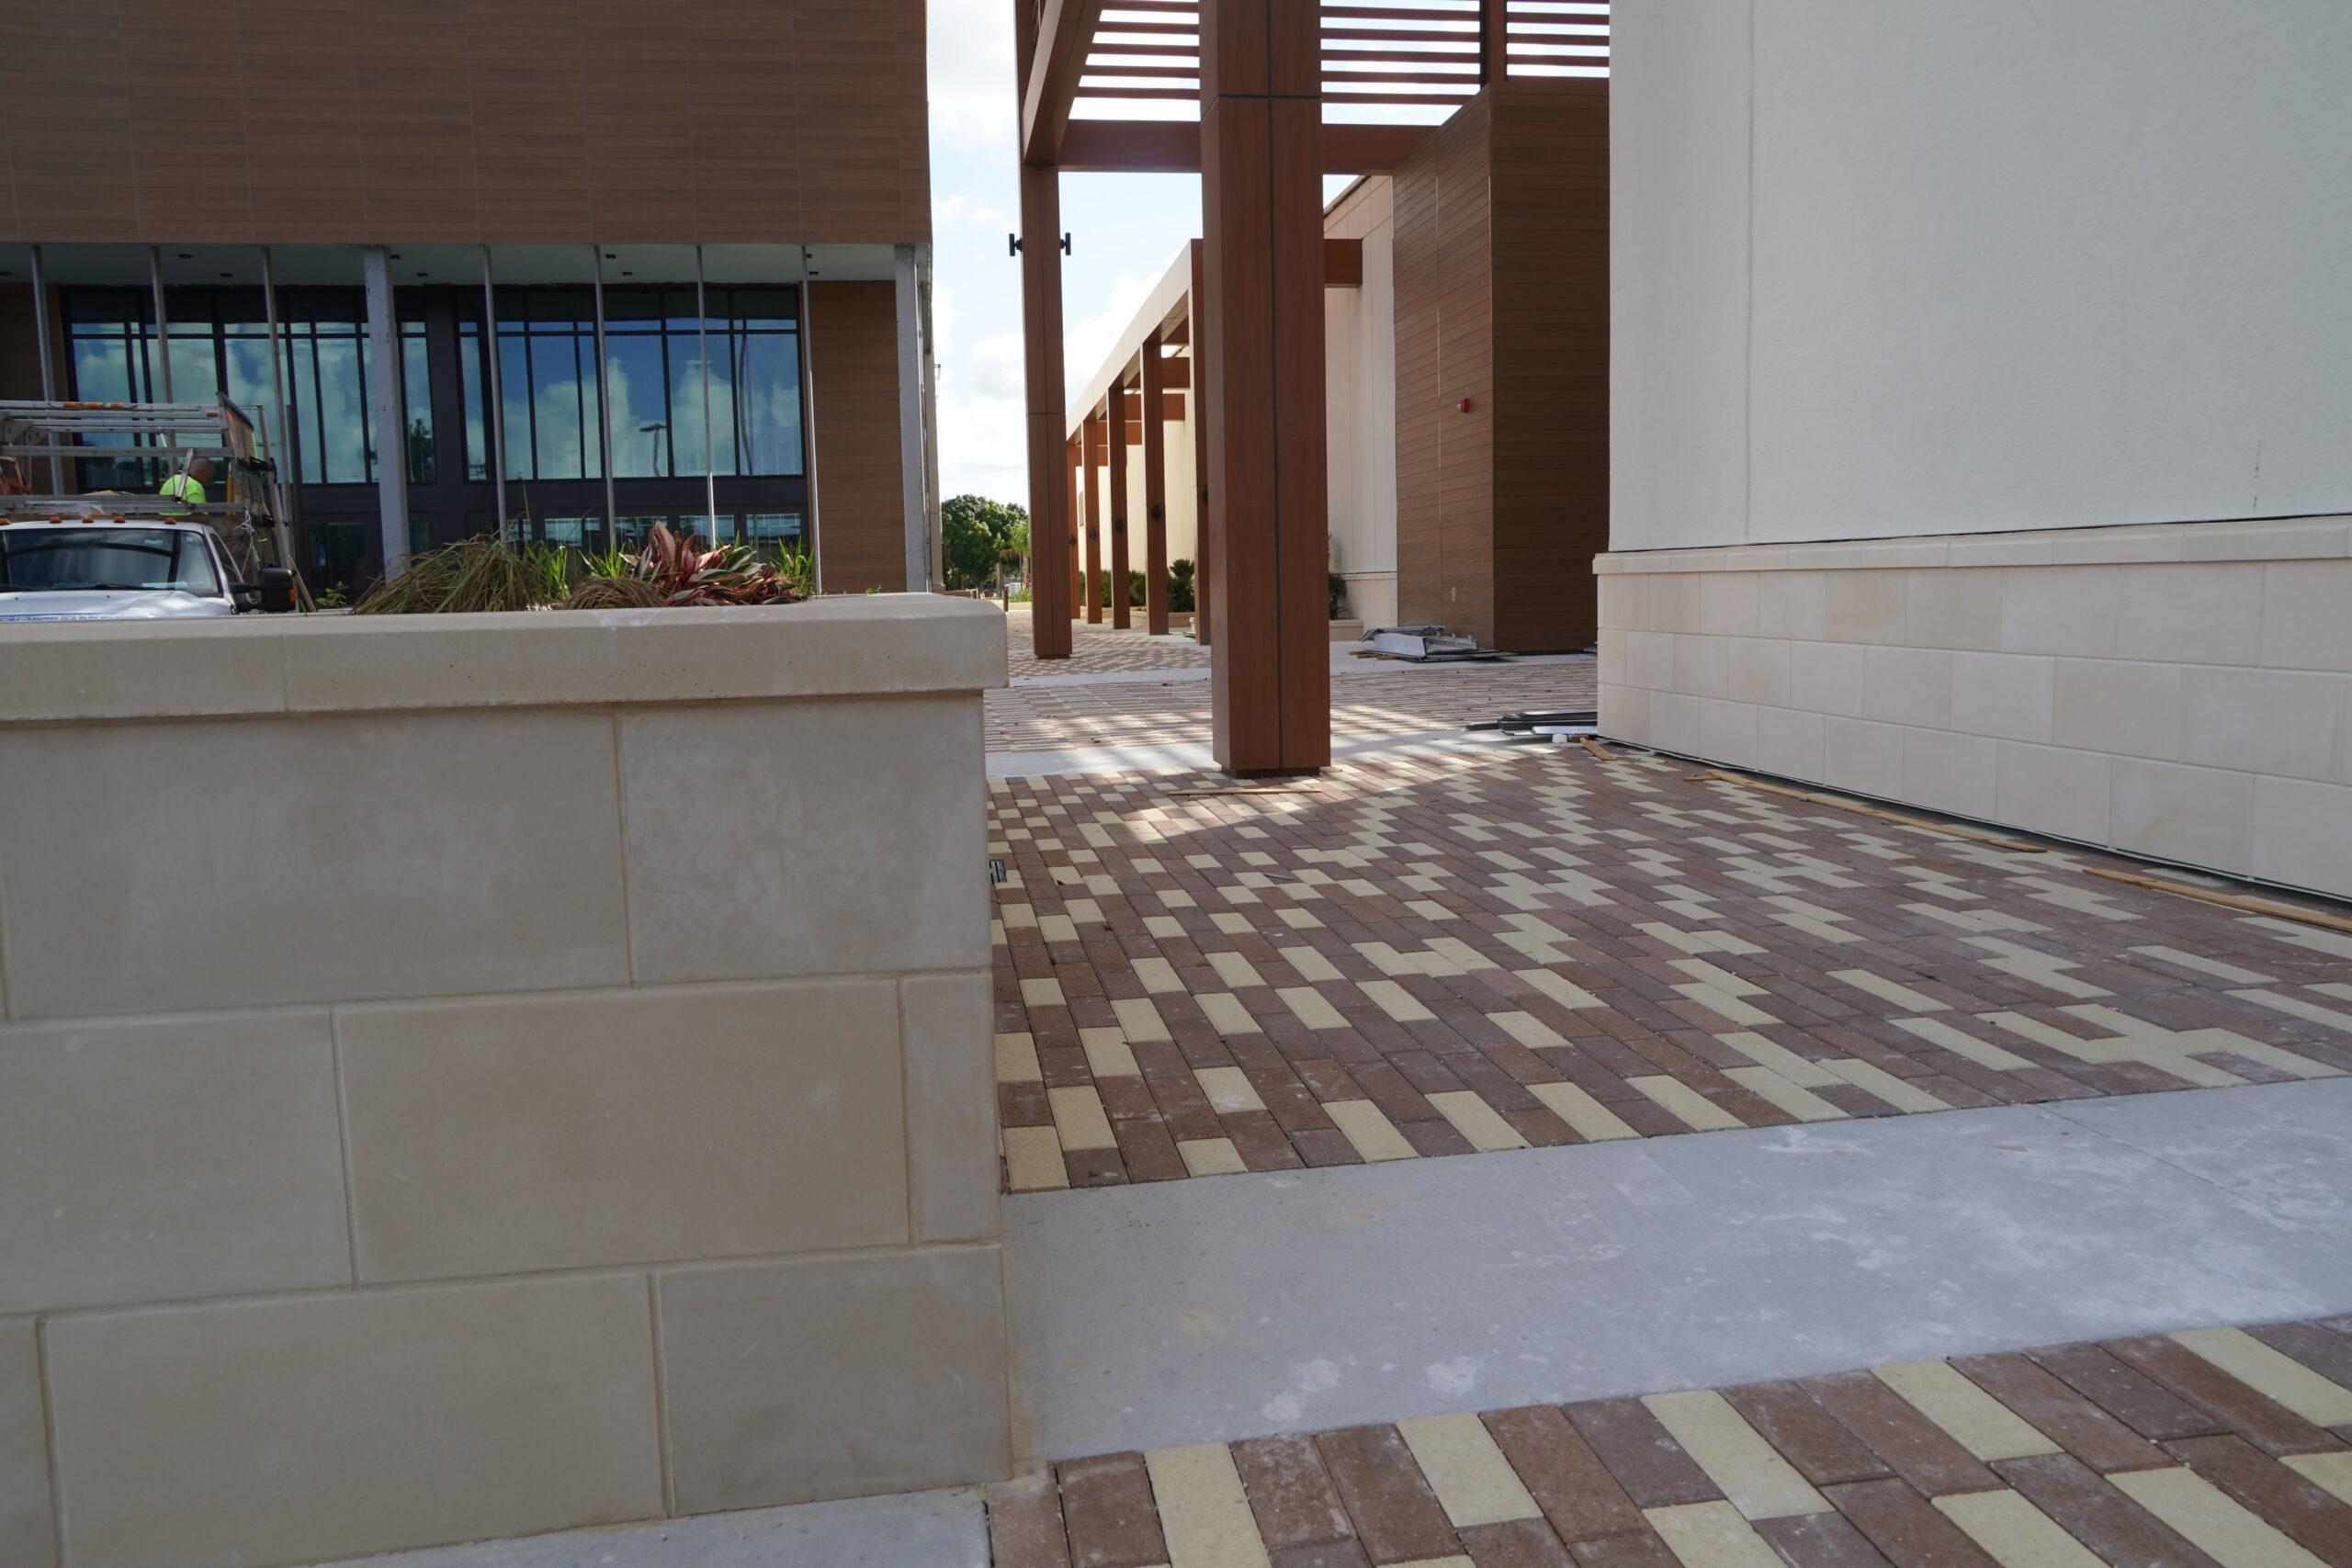 Coastland Center Commercial Paver Installation A